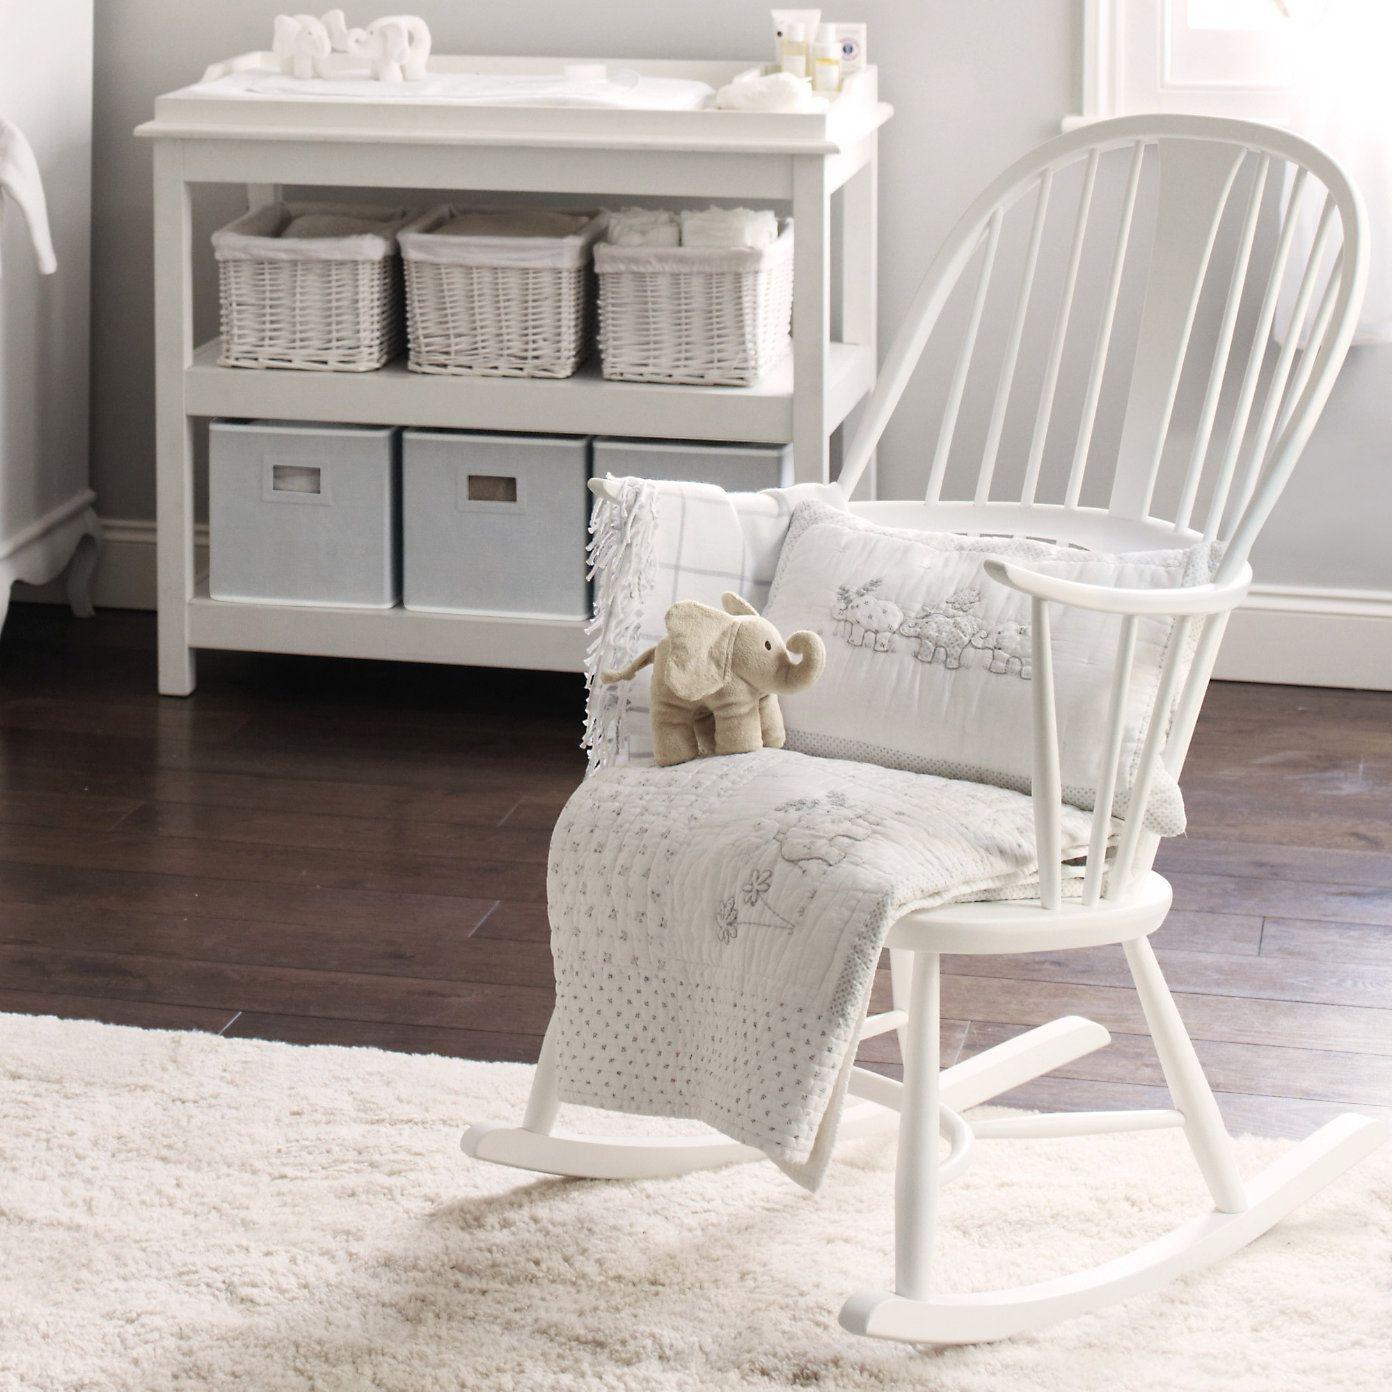 Ercol Rocking Chair  Ercol Furniture  The White Company